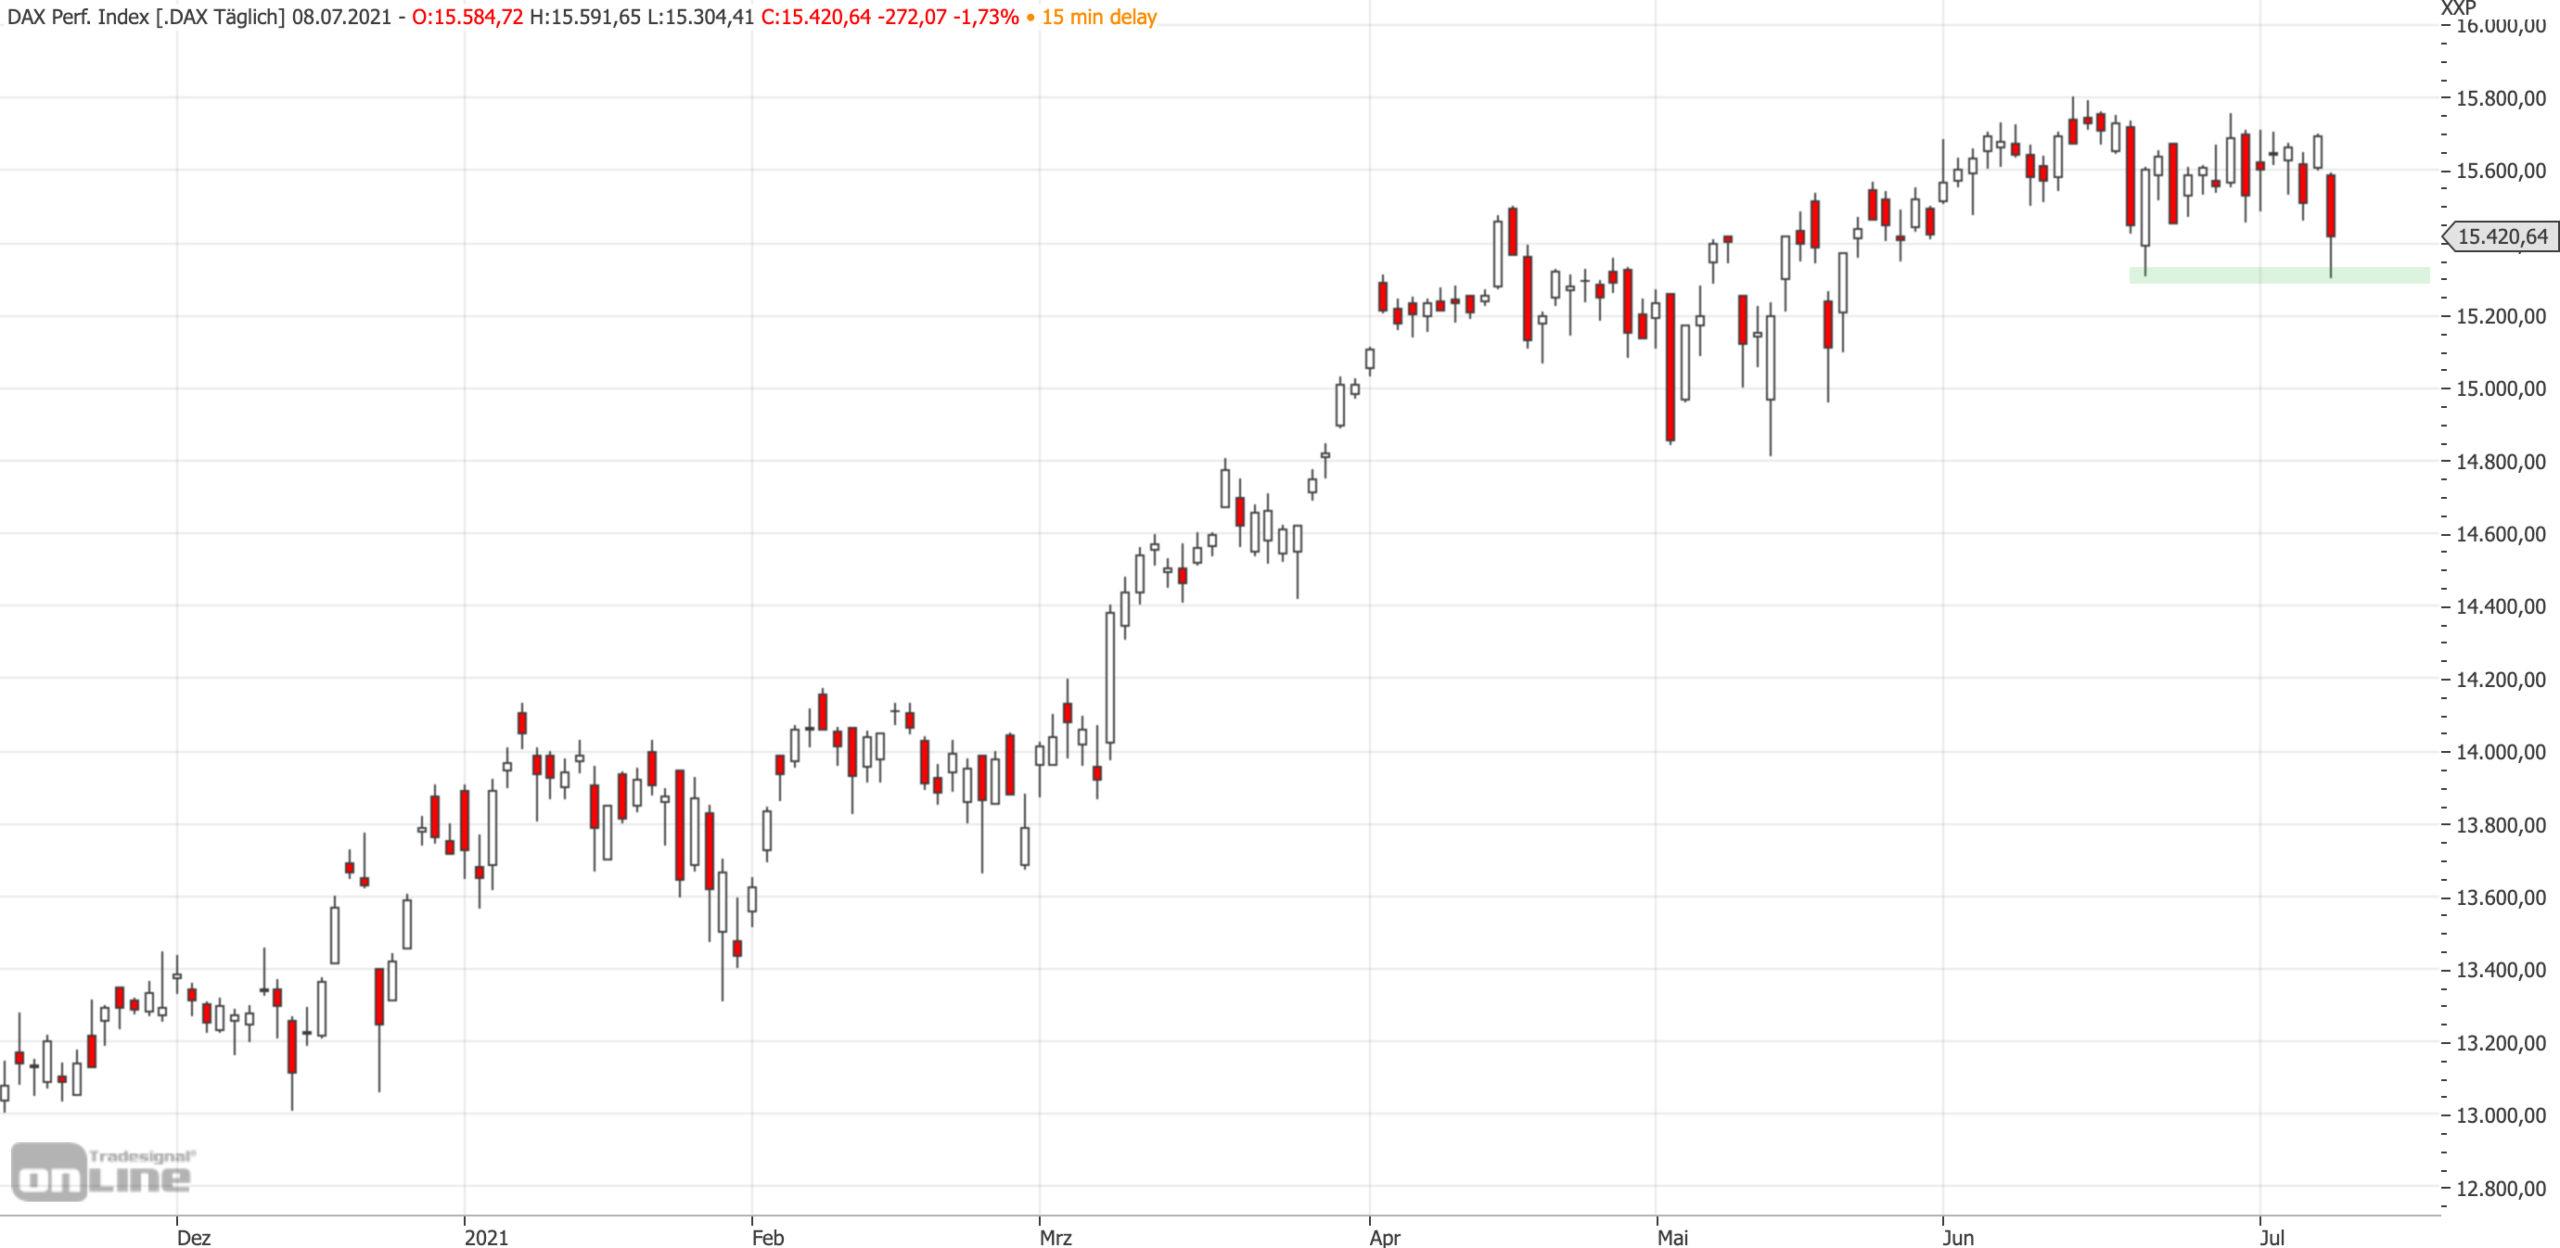 Mittelfristiger DAX-Chart am 08.07.2021